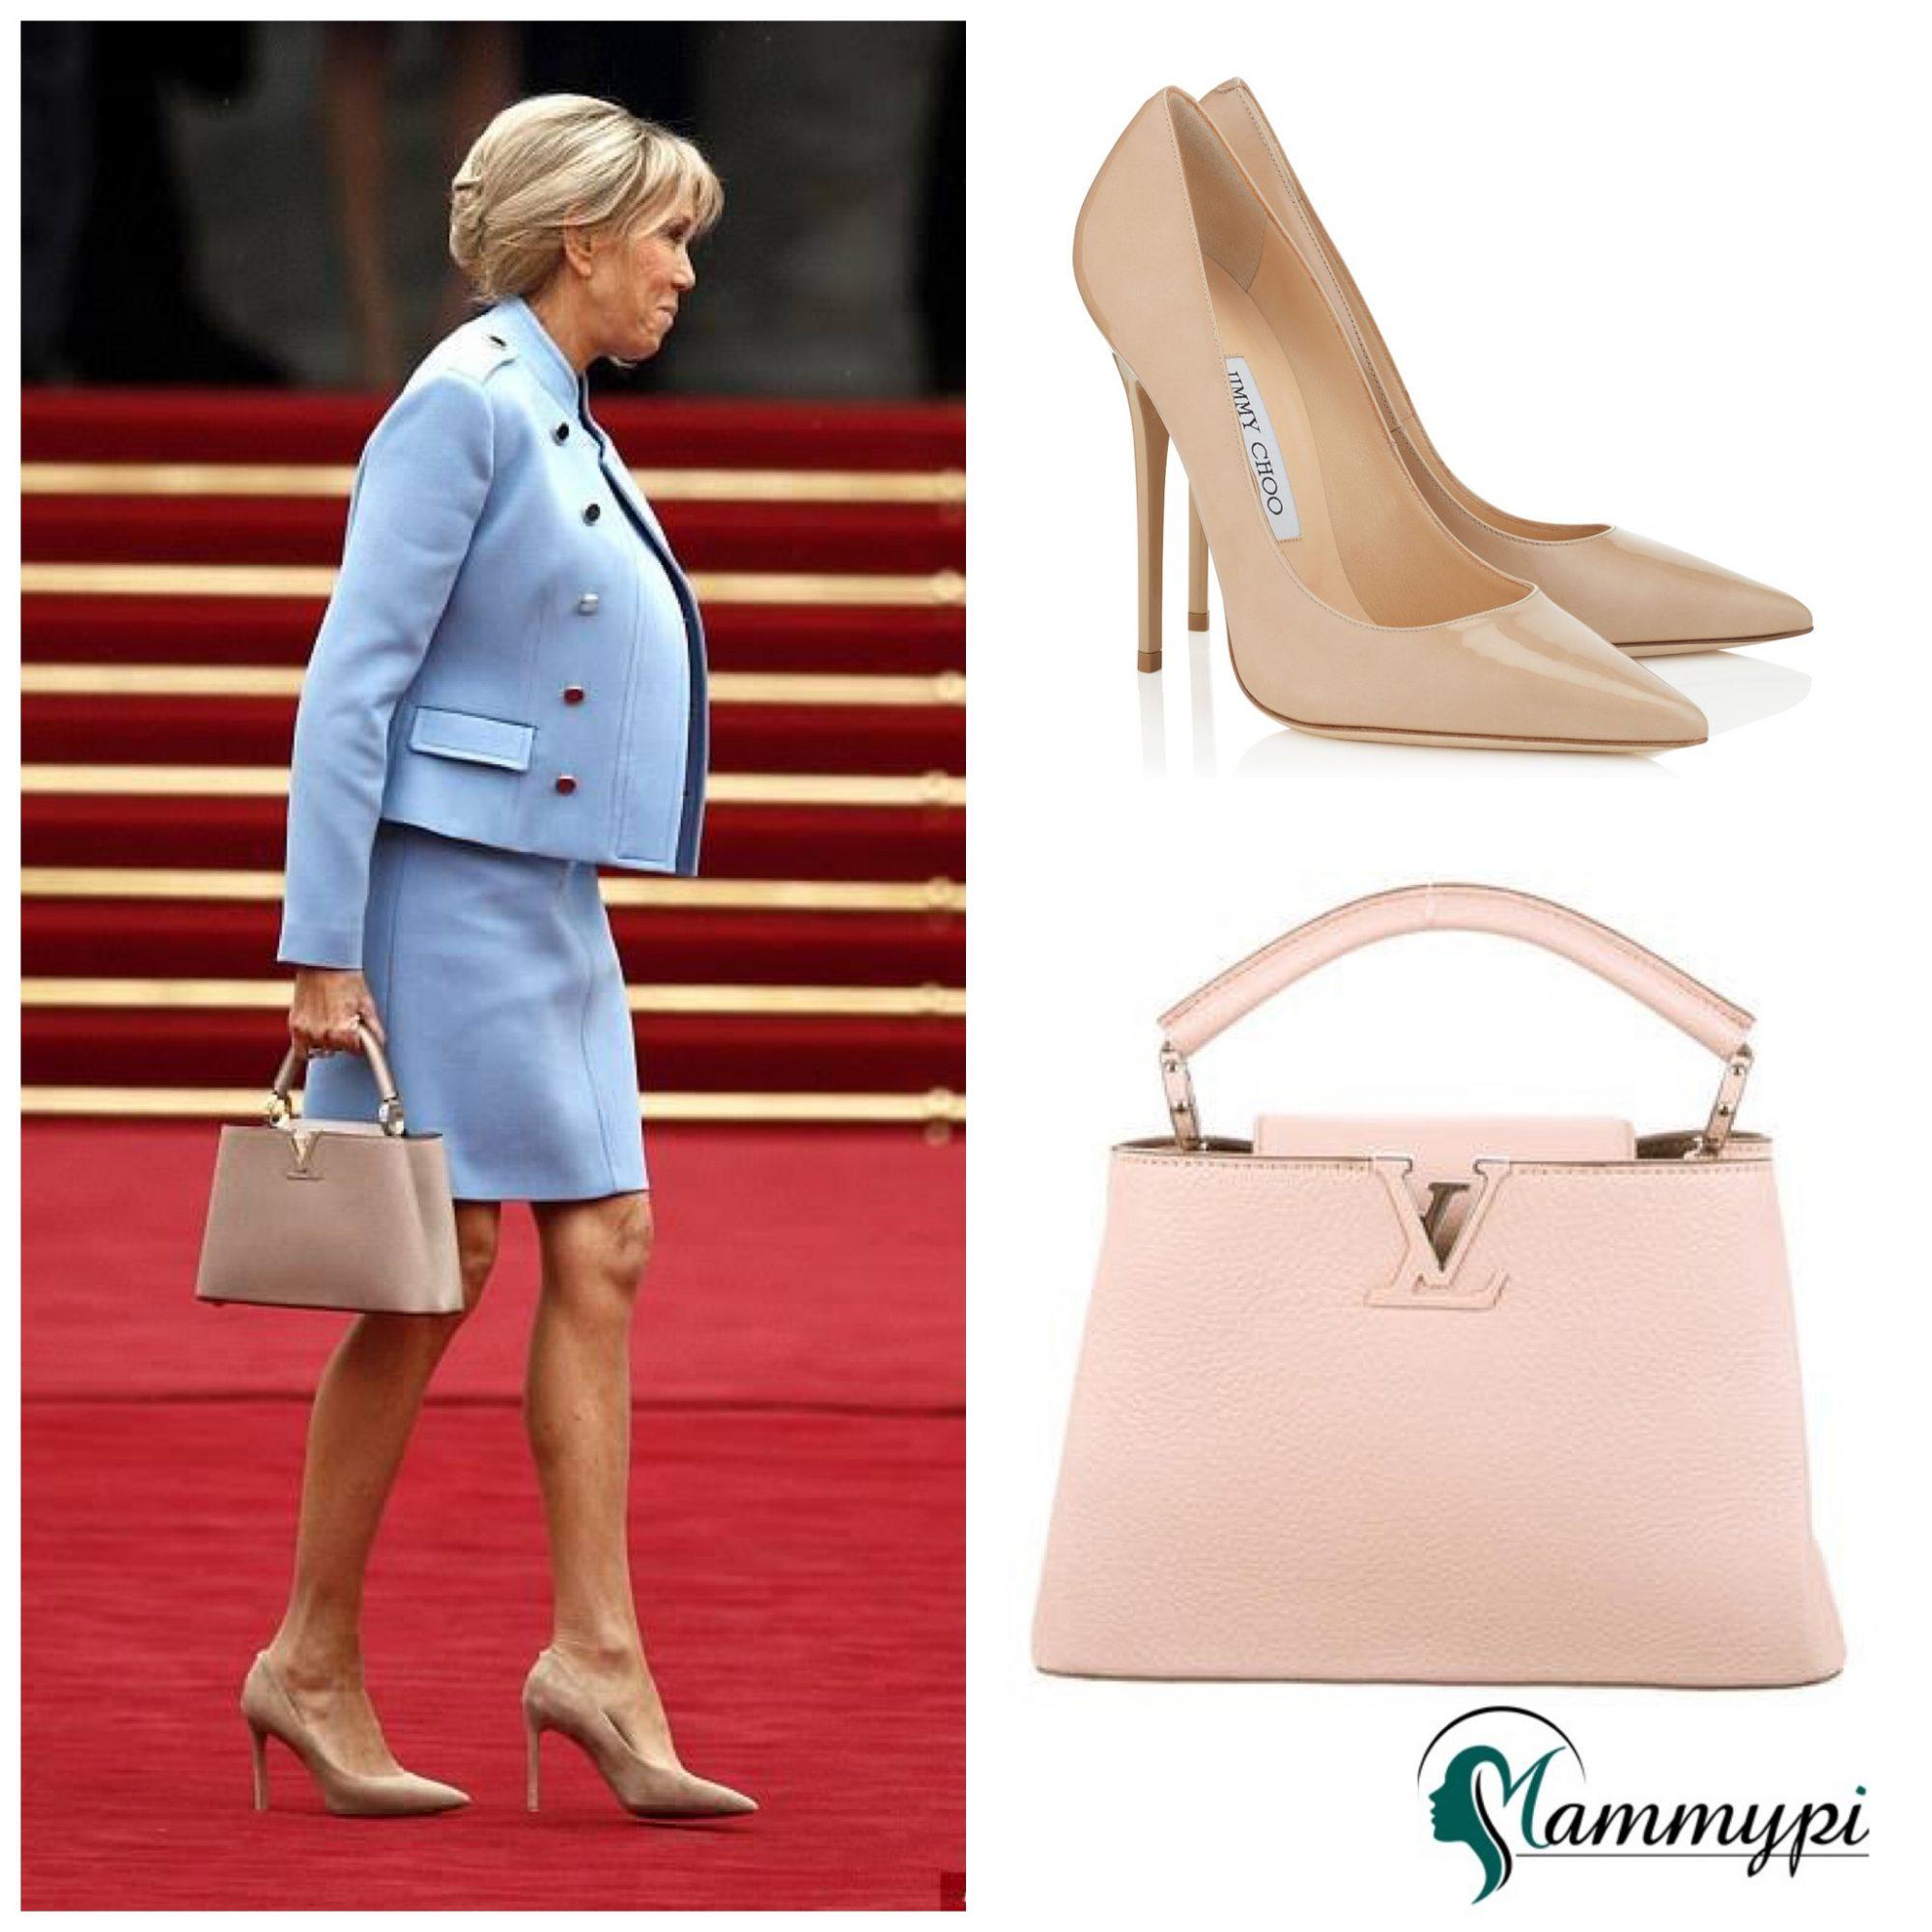 Brigitte Macron's Chic Style At Emmanuel Macron's Inauguration